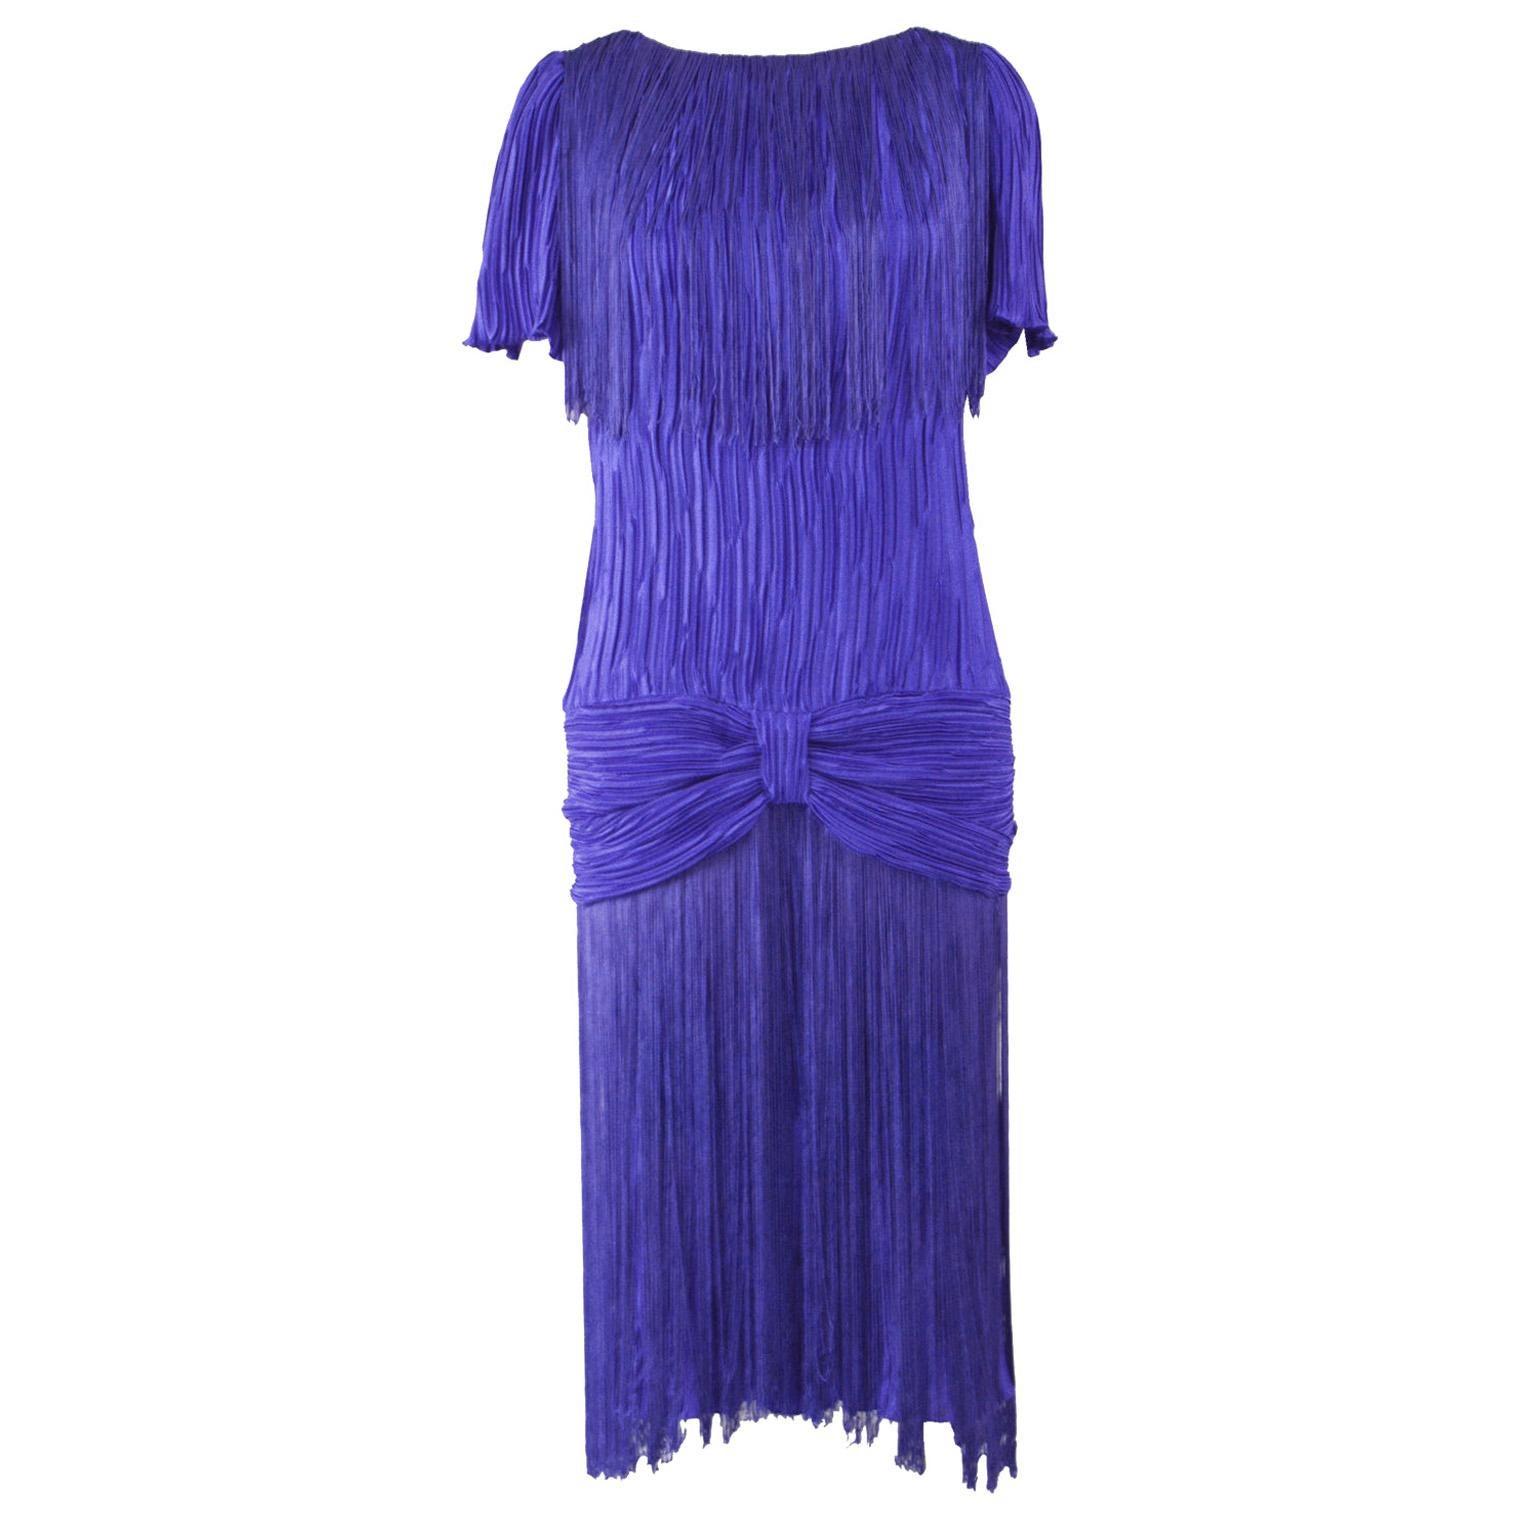 1980s Royal Blue Vintage Pleated & Fringed Dress